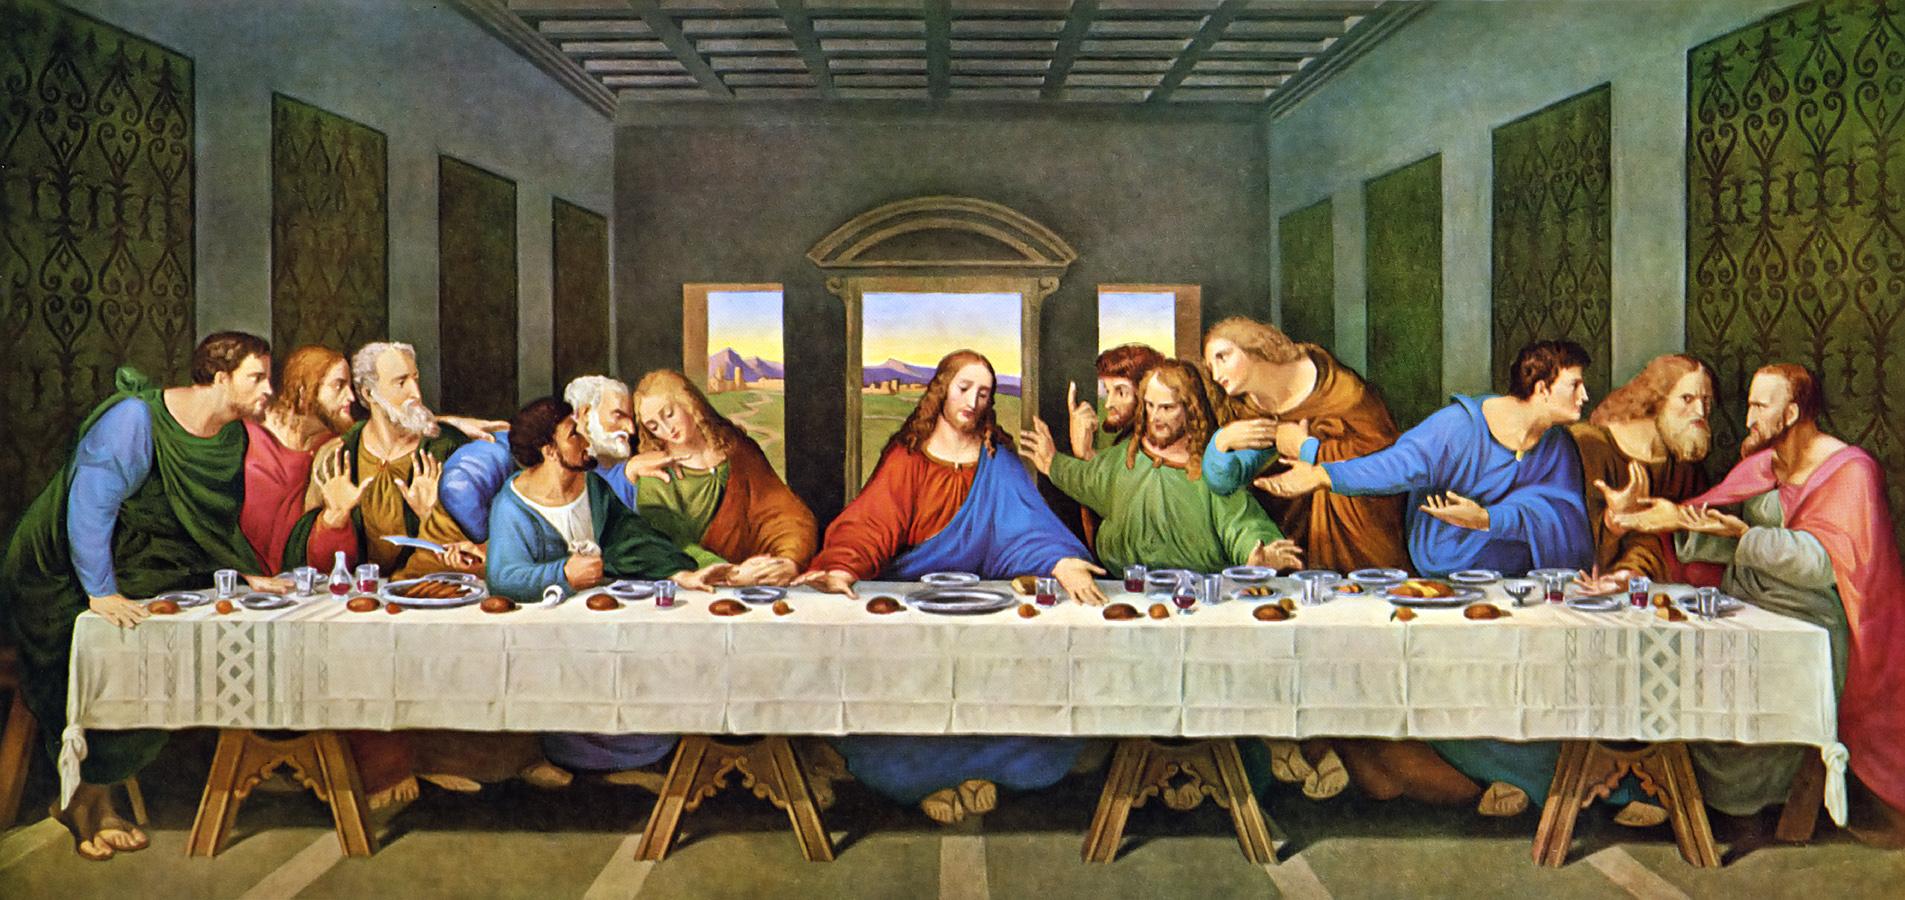 The last supper restored leonardo da vinic